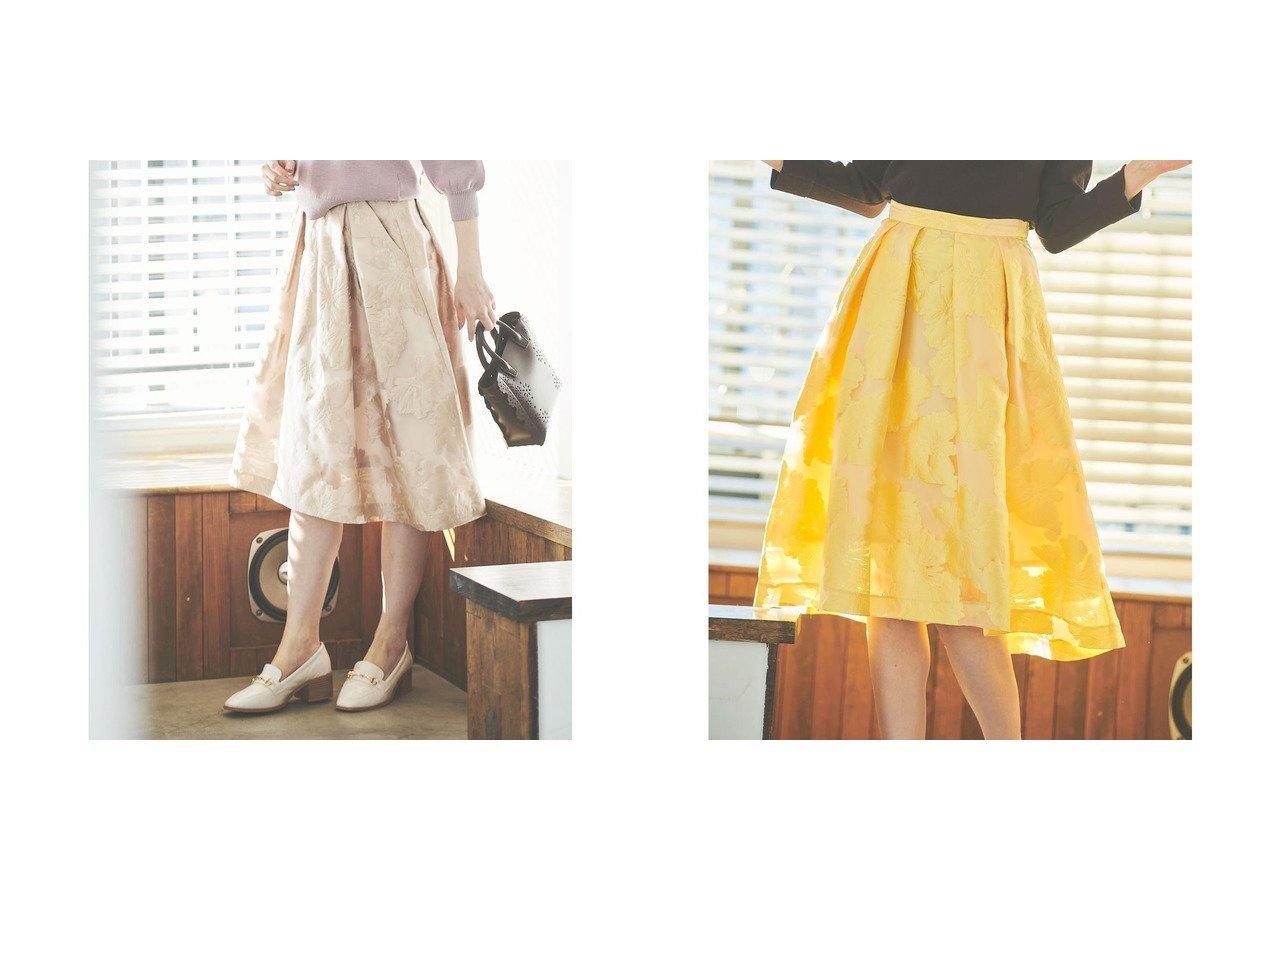 【31 Sons de mode/トランテアン ソン ドゥ モード】の花柄ジャガードスカート スカートのおすすめ!人気、トレンド・レディースファッションの通販  おすすめで人気の流行・トレンド、ファッションの通販商品 メンズファッション・キッズファッション・インテリア・家具・レディースファッション・服の通販 founy(ファニー) https://founy.com/ ファッション Fashion レディースファッション WOMEN スカート Skirt 2021年 2021 2021 春夏 S/S SS Spring/Summer 2021 S/S 春夏 SS Spring/Summer イエロー ラベンダー 春 Spring |ID:crp329100000015608